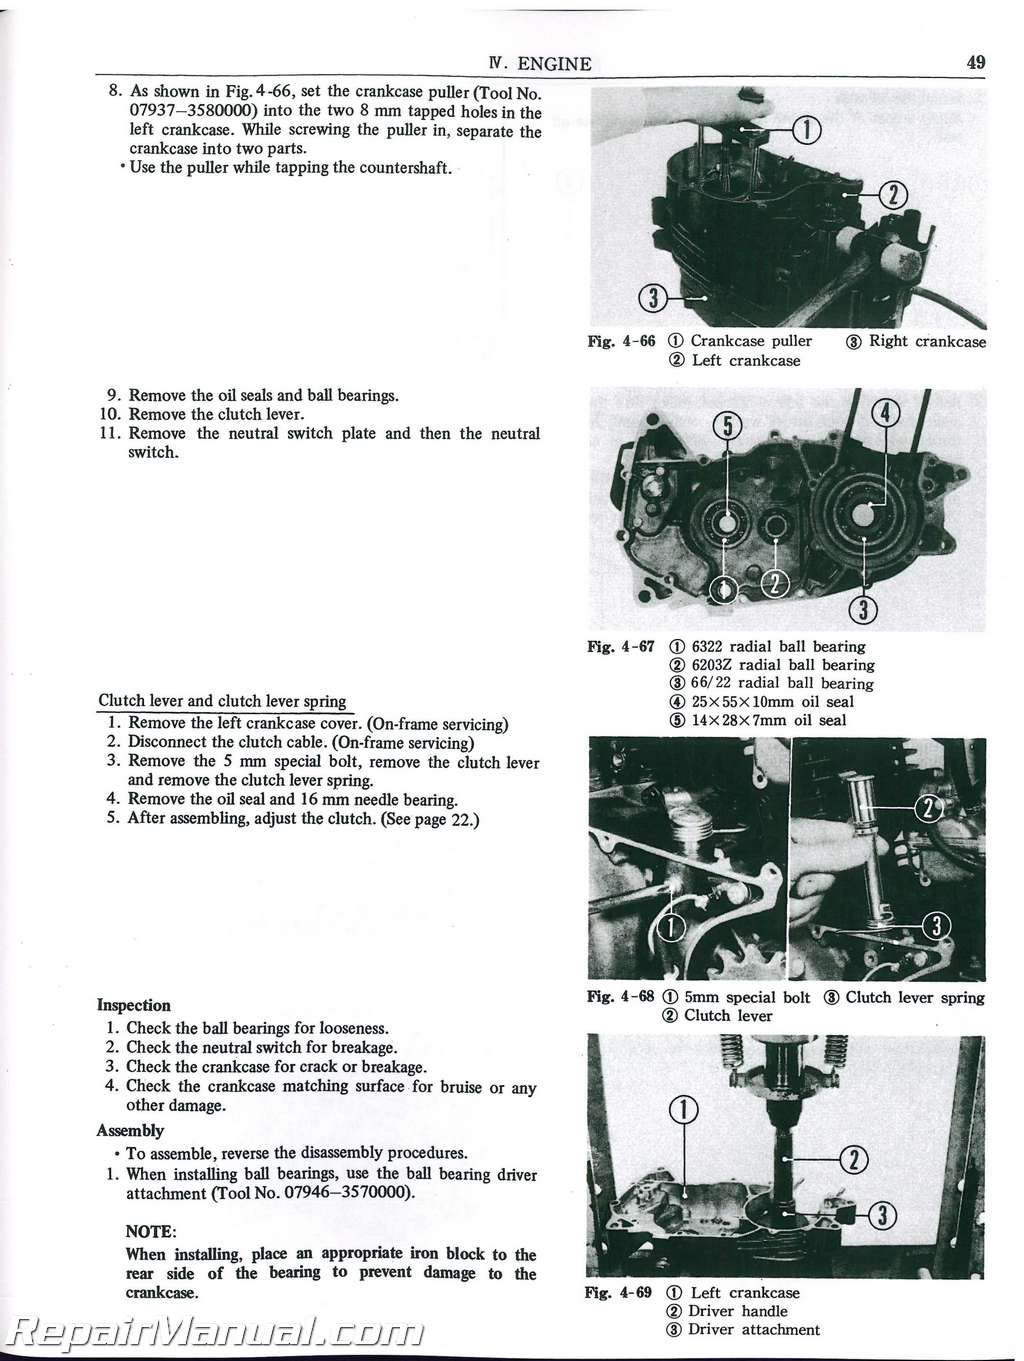 1973 1974 1975 1976 honda mt250 elsinore motorcycle service manual rh repairmanual com